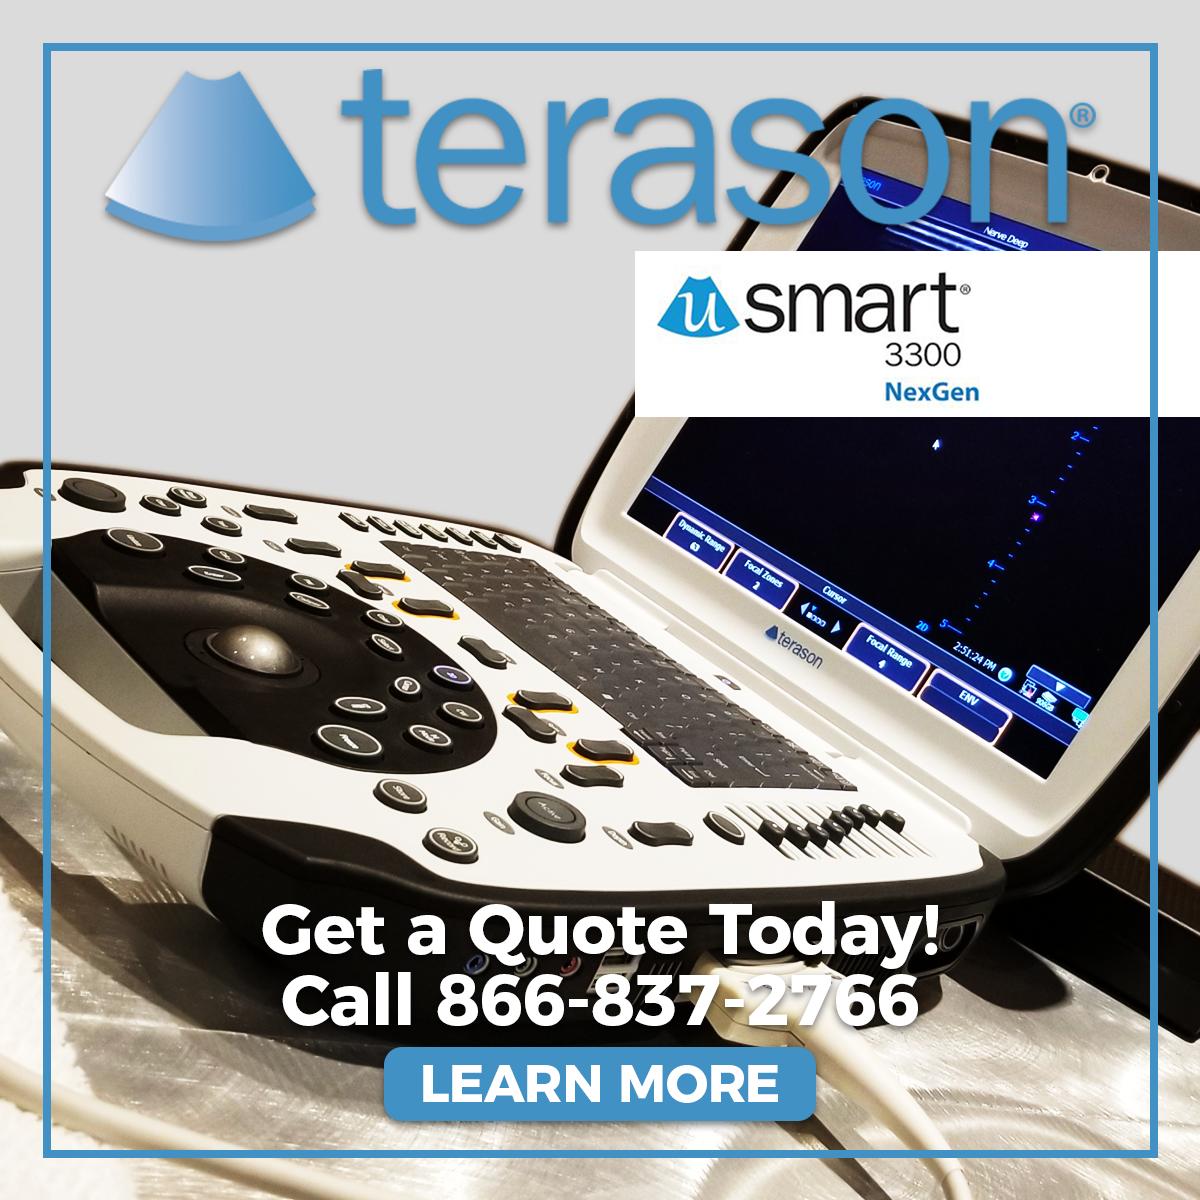 Terason Ultrasound.png